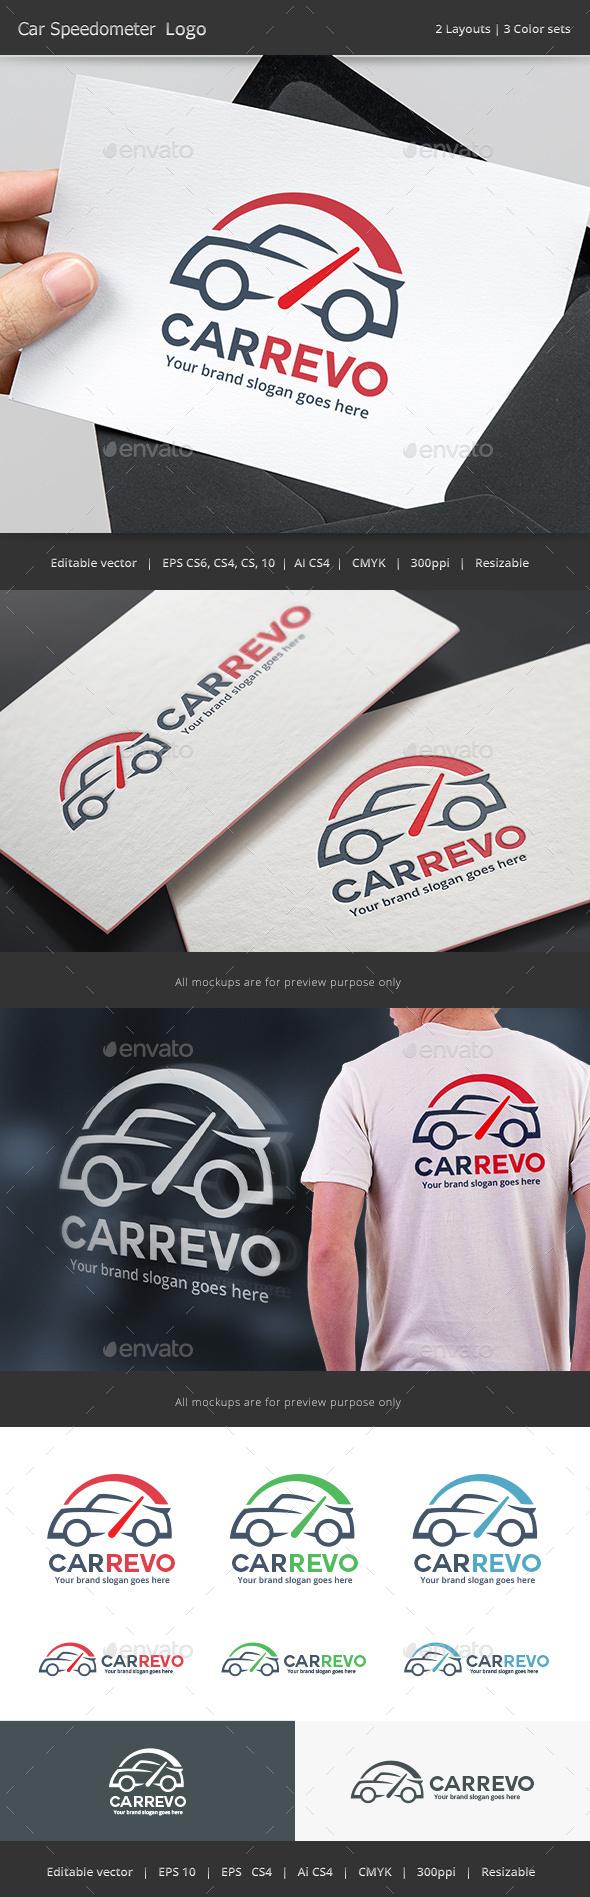 Car Speedometer Logo - Vector Abstract